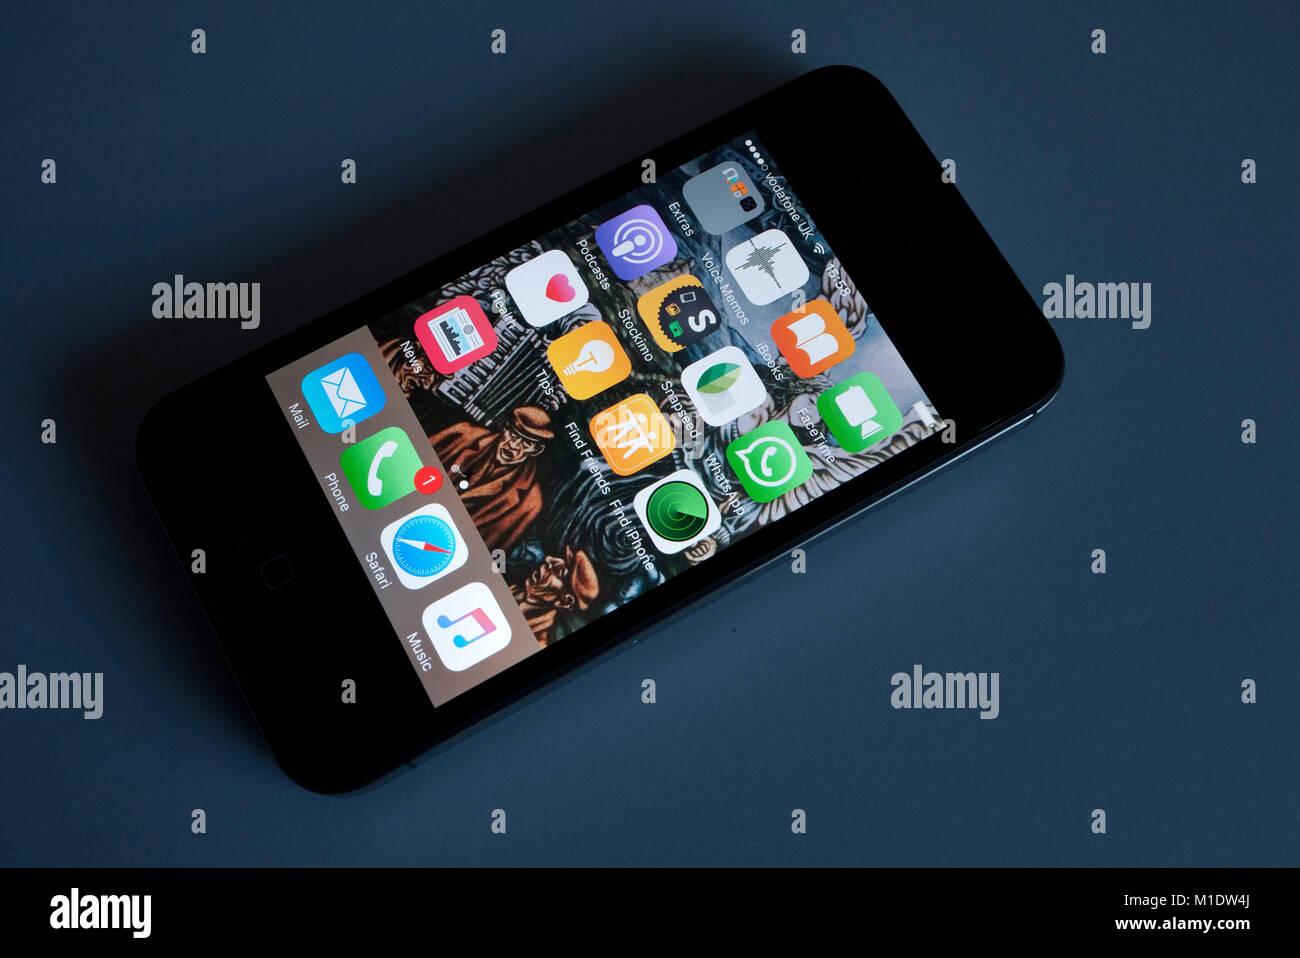 I Phone 4 S che mostra le app, UK. Immagini Stock